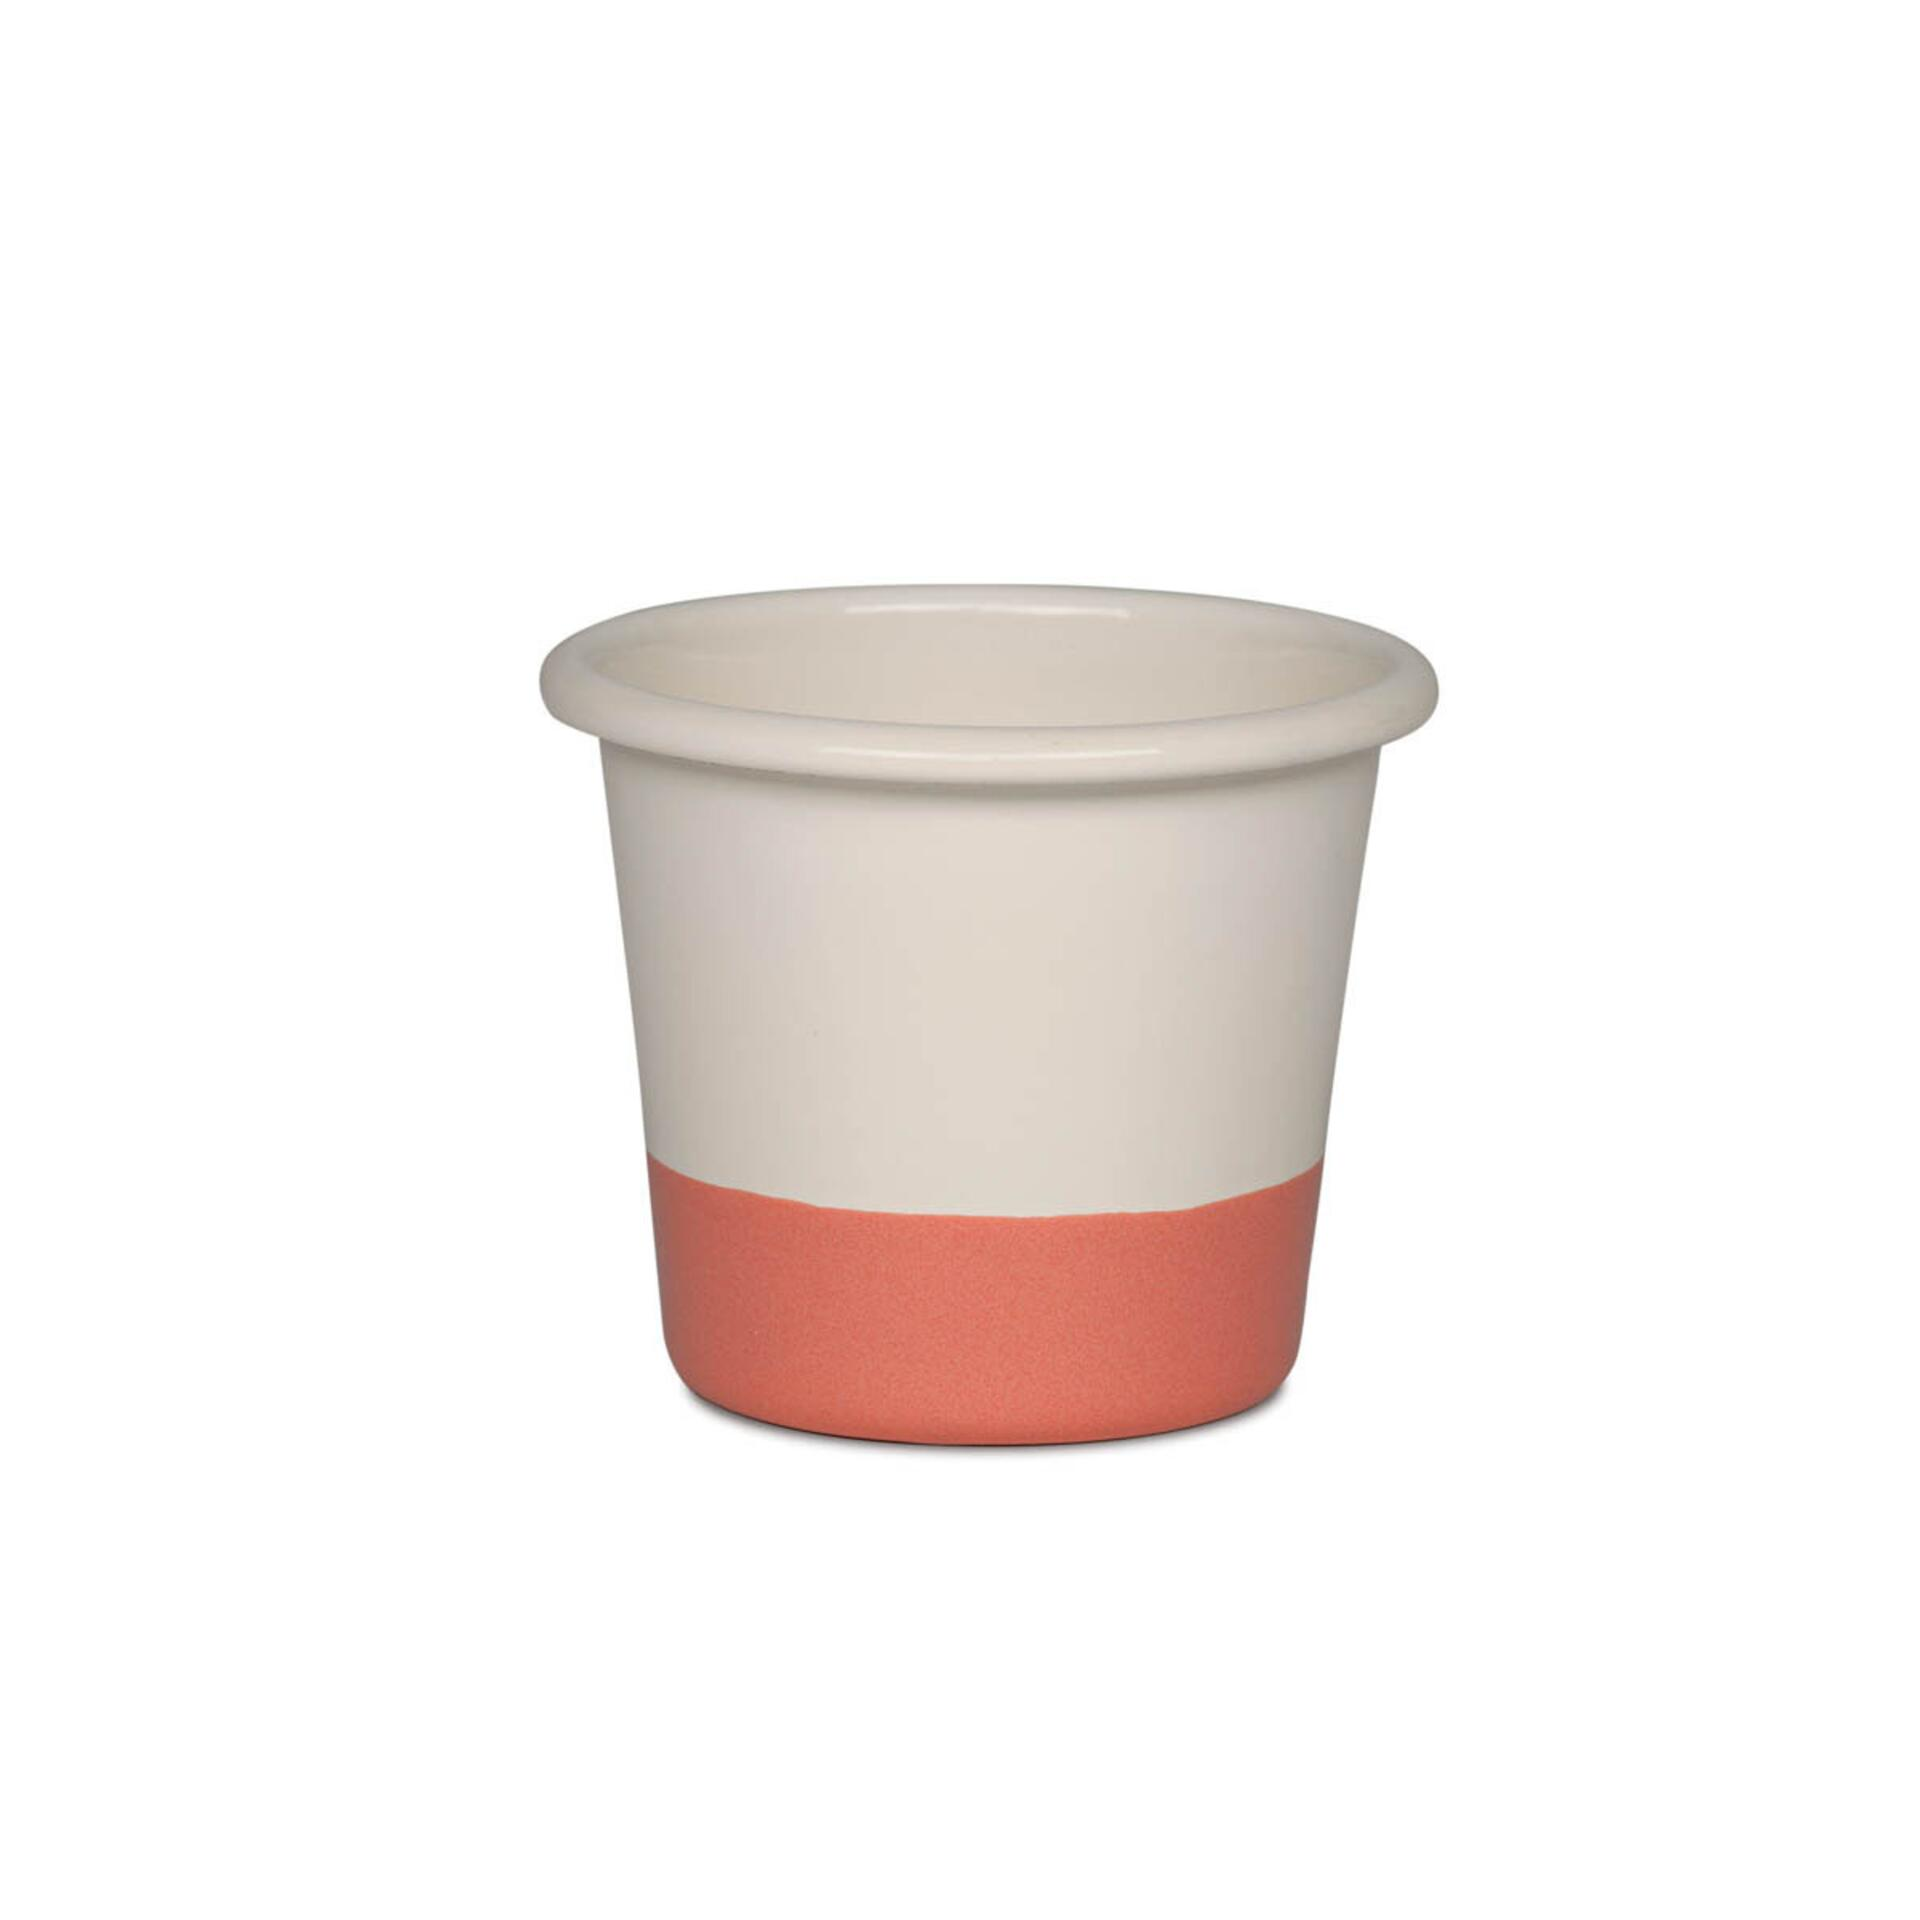 Riess Muffinform Obers/Pfirsich Edition Sarah Wiener 8 cm